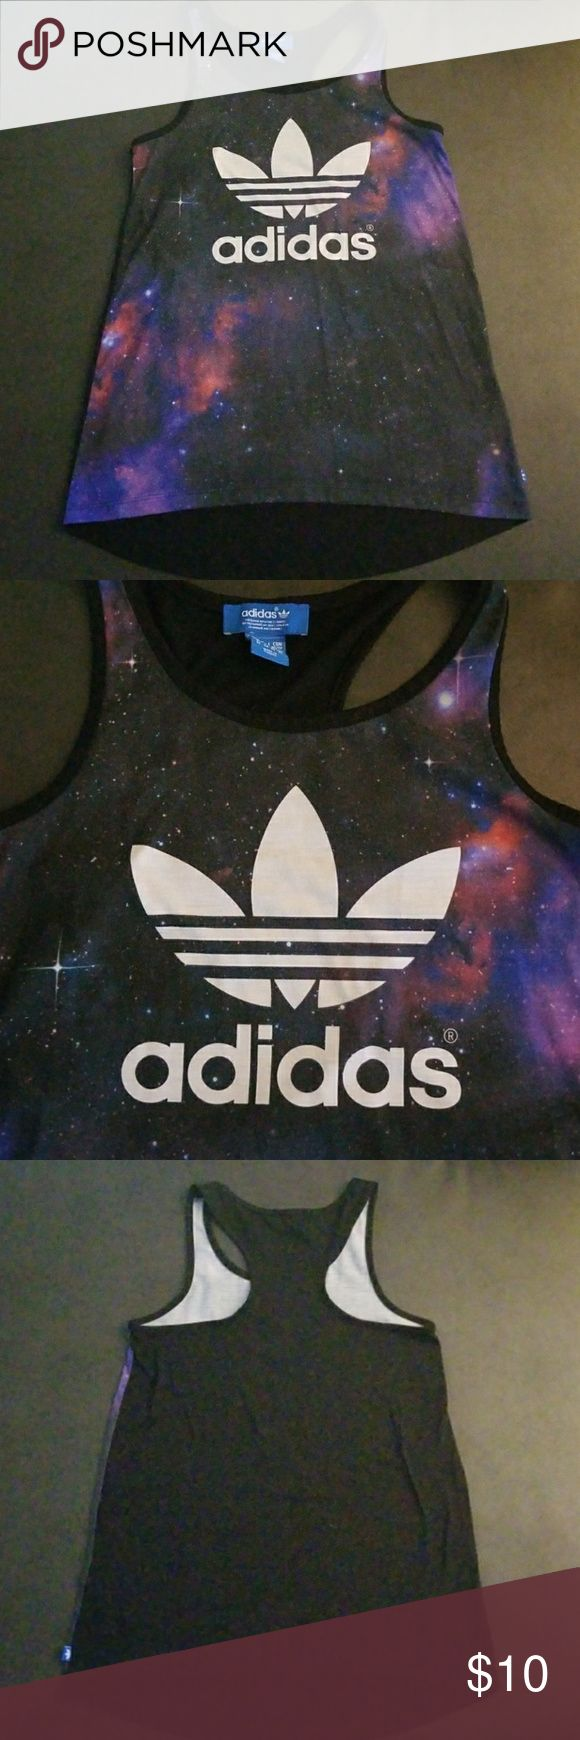 Adidas galaxy tank top Adidas galaxy long tank top adidas Tops Tank Tops